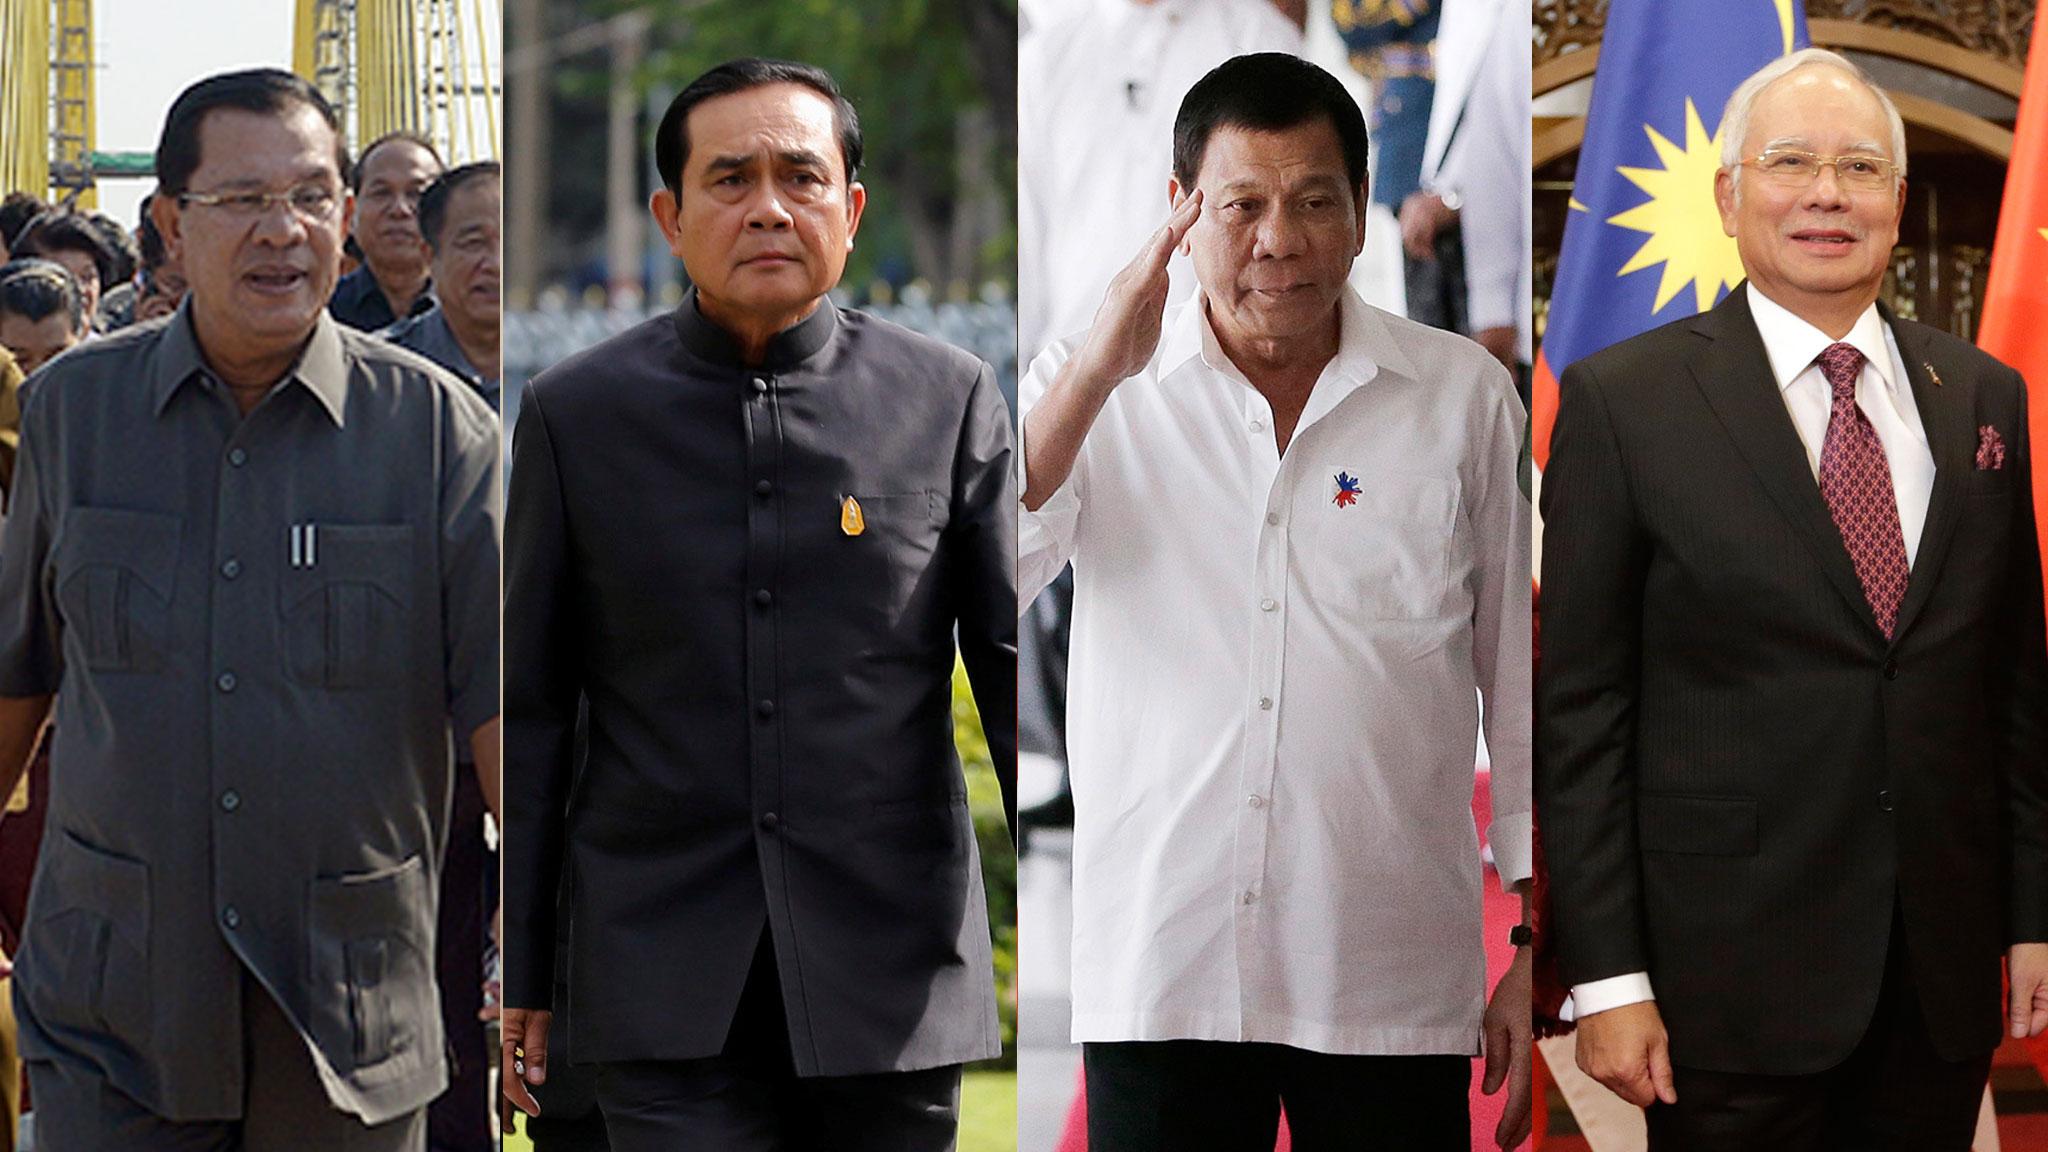 From left: Cambodia's Prime Minister Hun Sen; Thailand prime minister Prayuth Chan-ocha; Philippine president Rodrigo Duterte; Malaysian Prime Minister Najib Razak